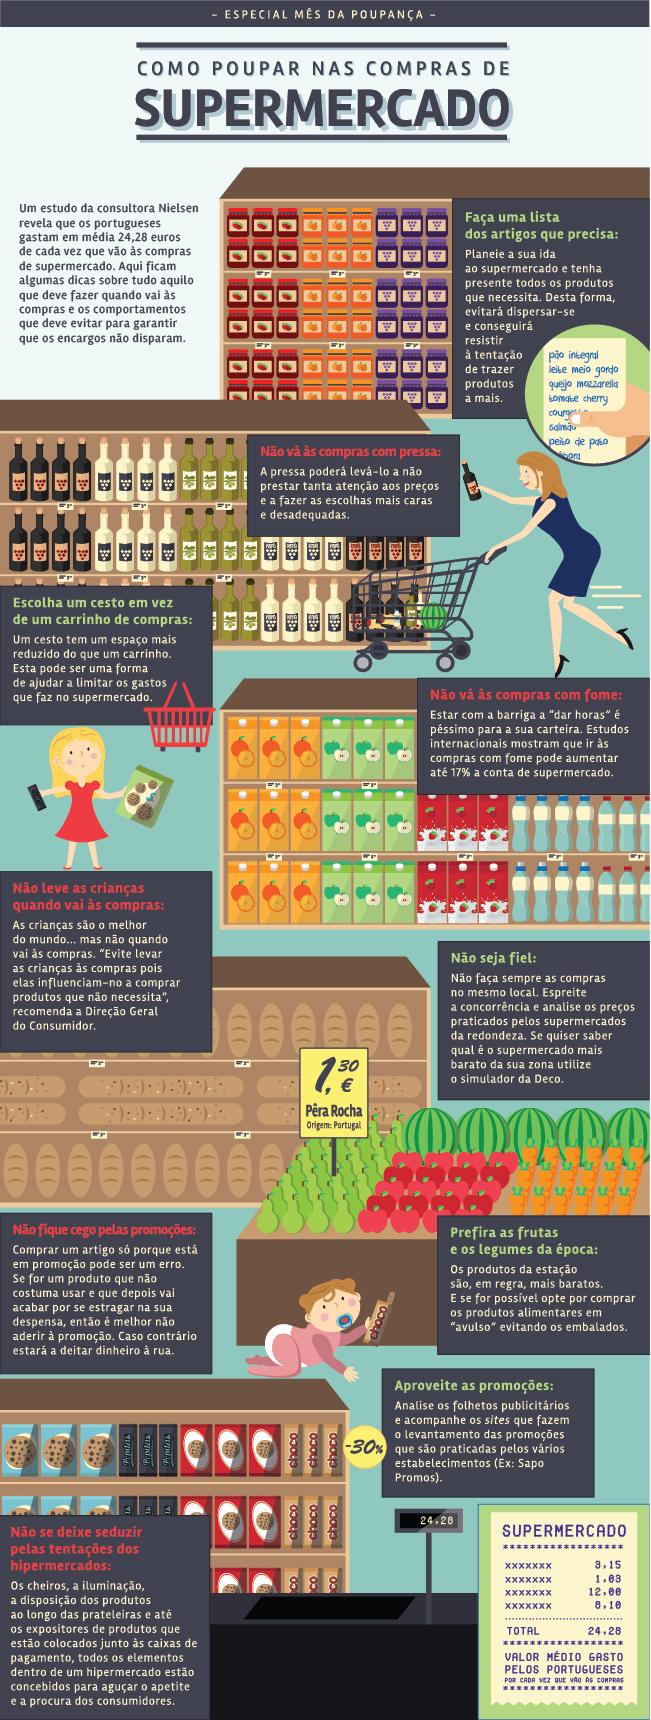 info-supermercad.jpg